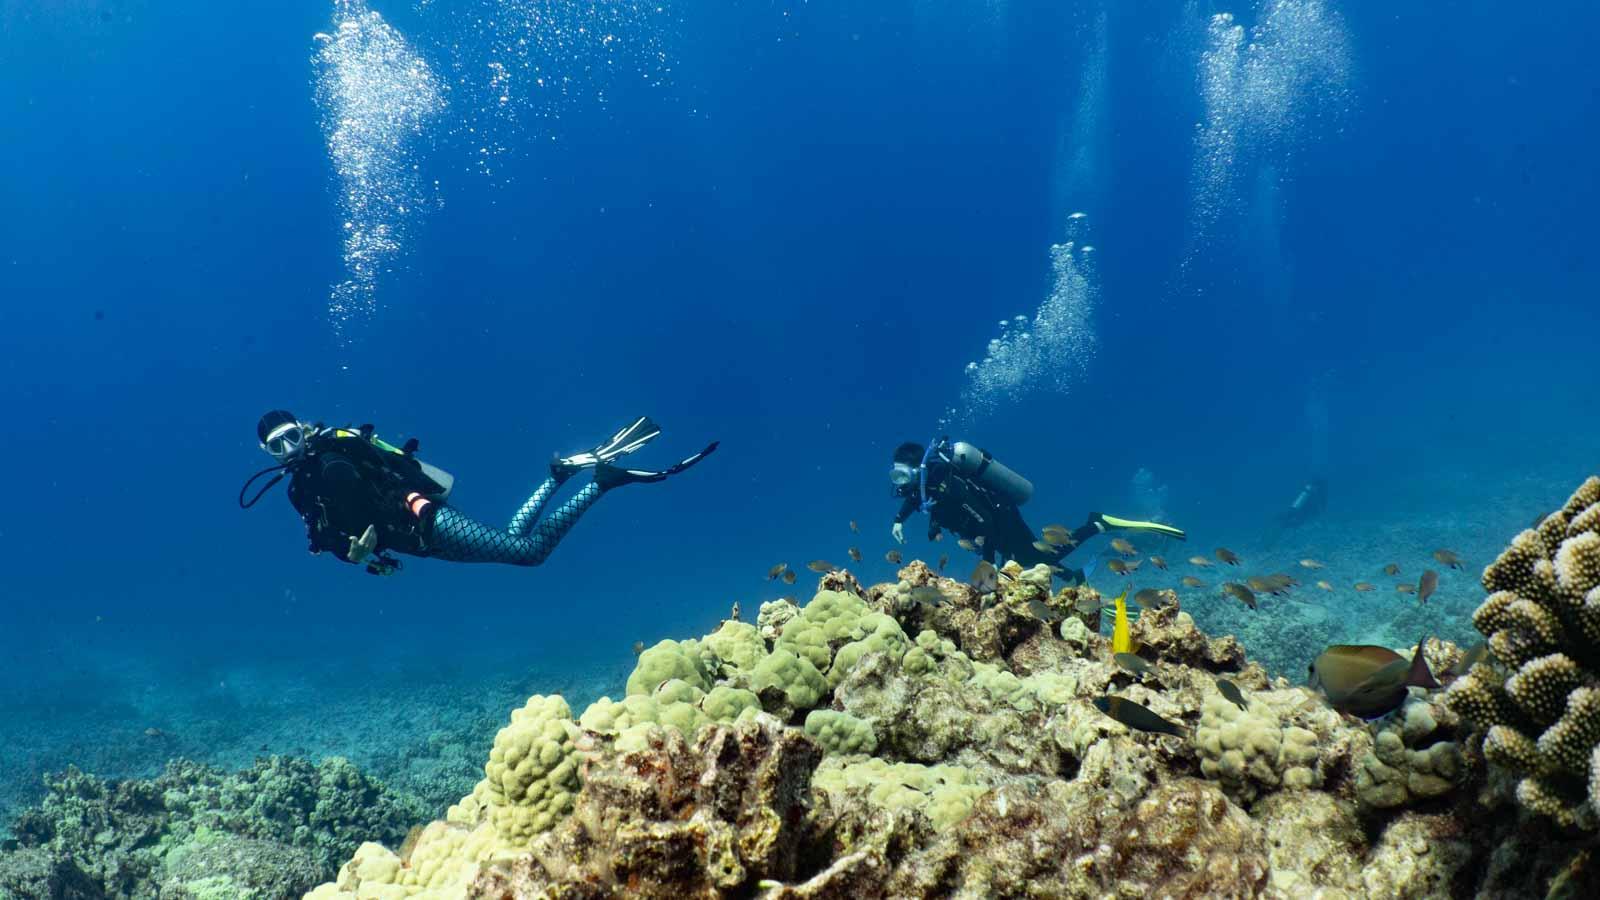 Scuba-Diving-Hawaii-Kona-Honu-Divers-24